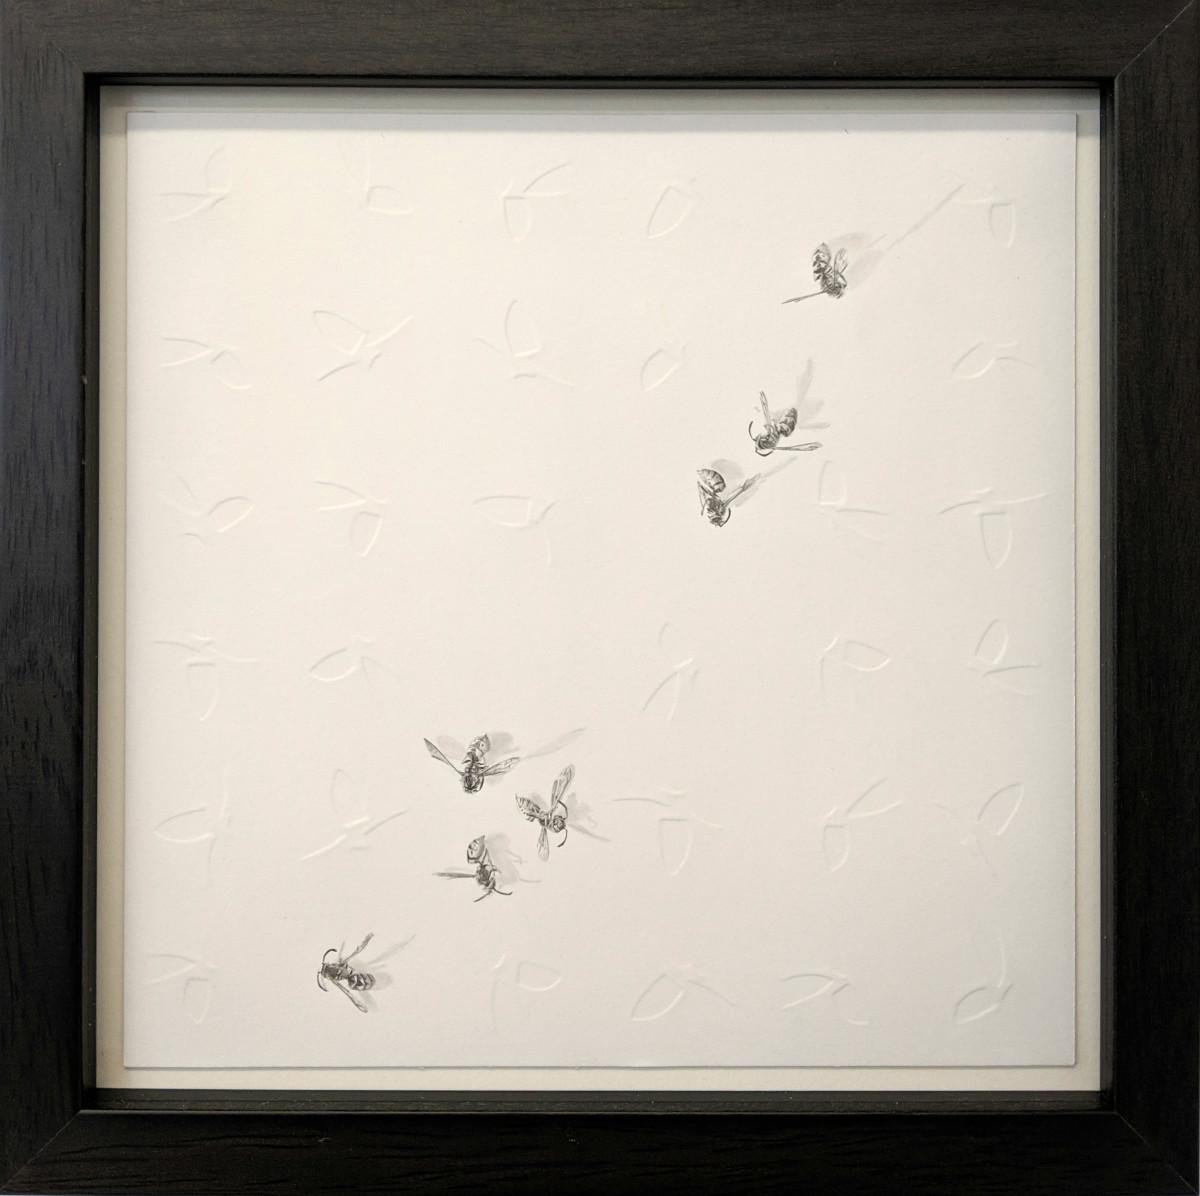 Flight Path xxvi by Louisa Crispin